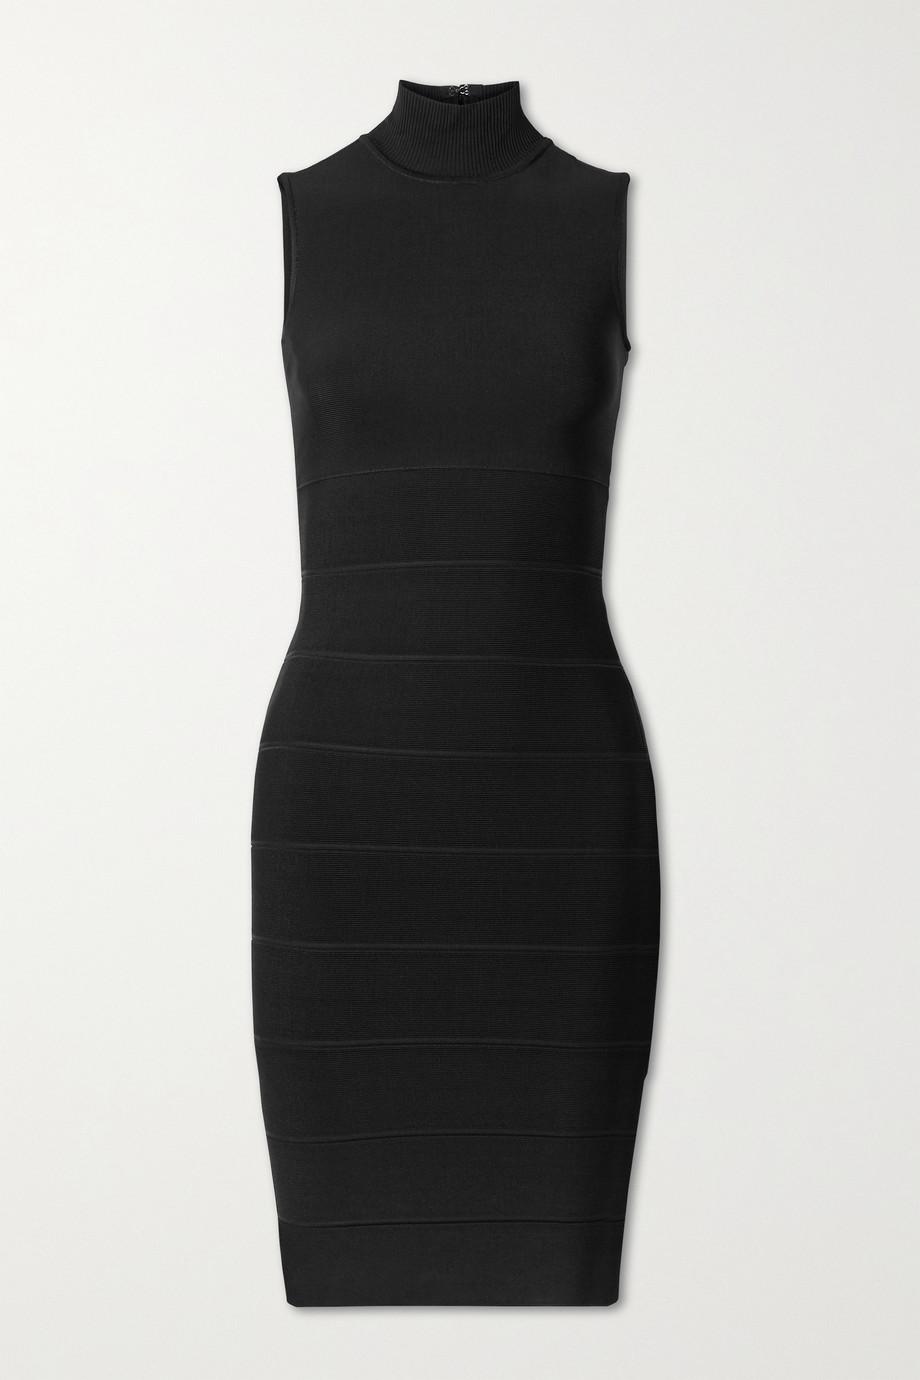 Hervé Léger Icon bandage turtleneck dress